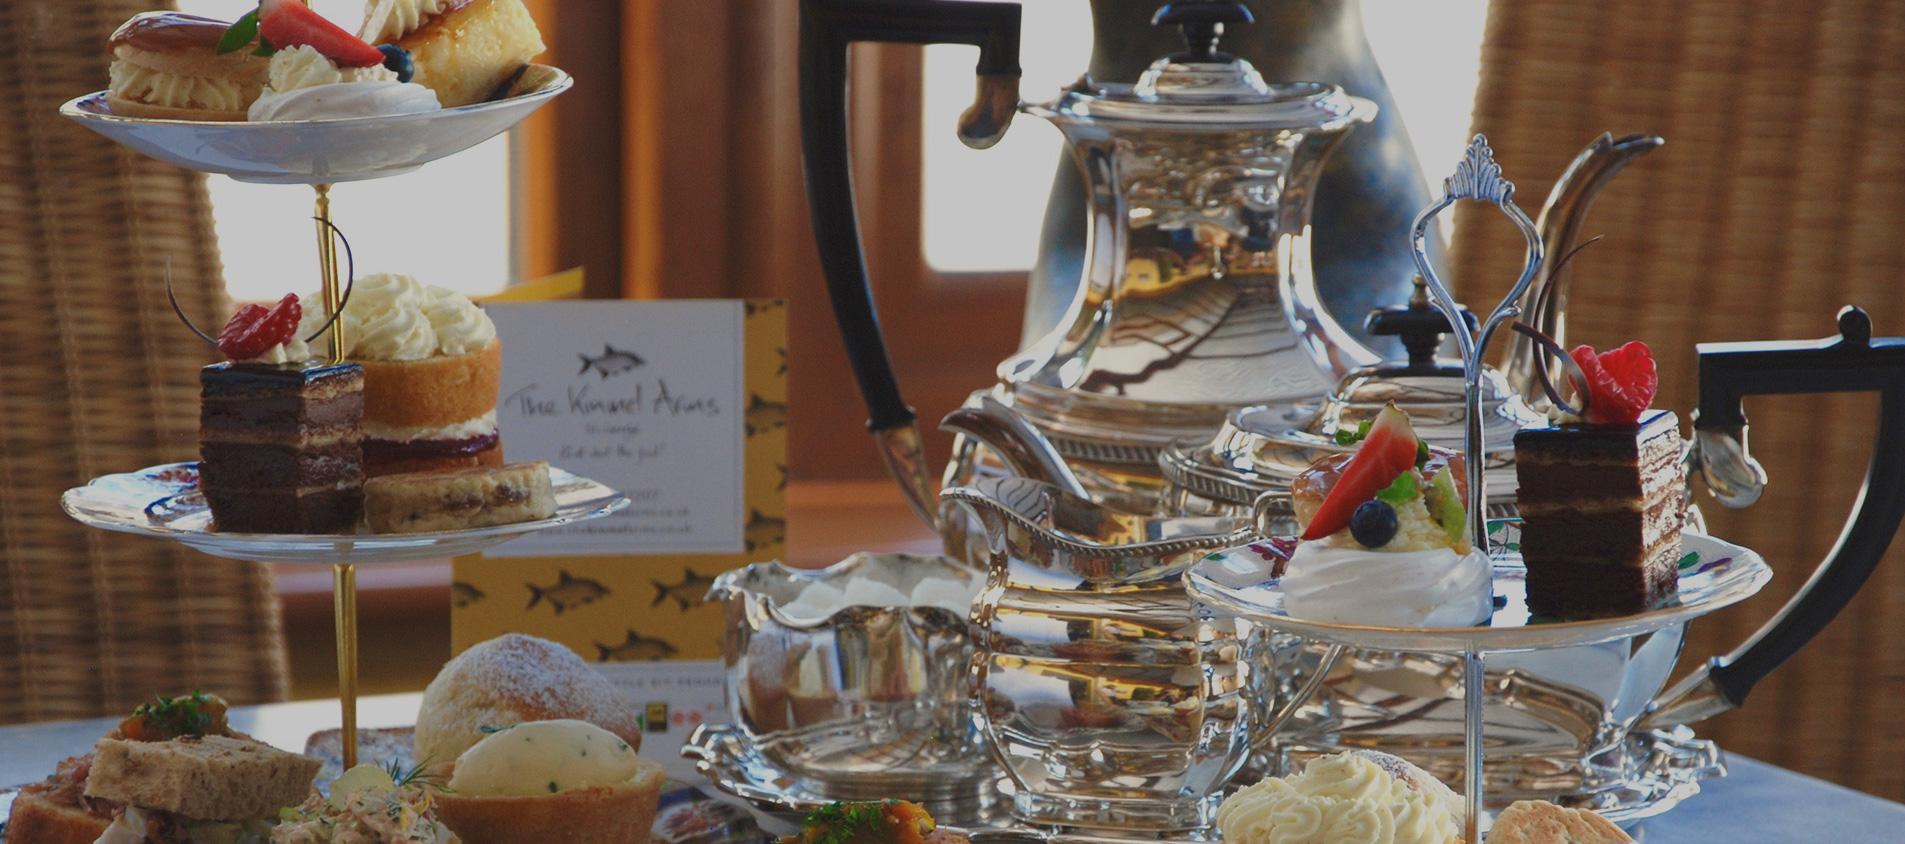 afternoon-tea-north-wales